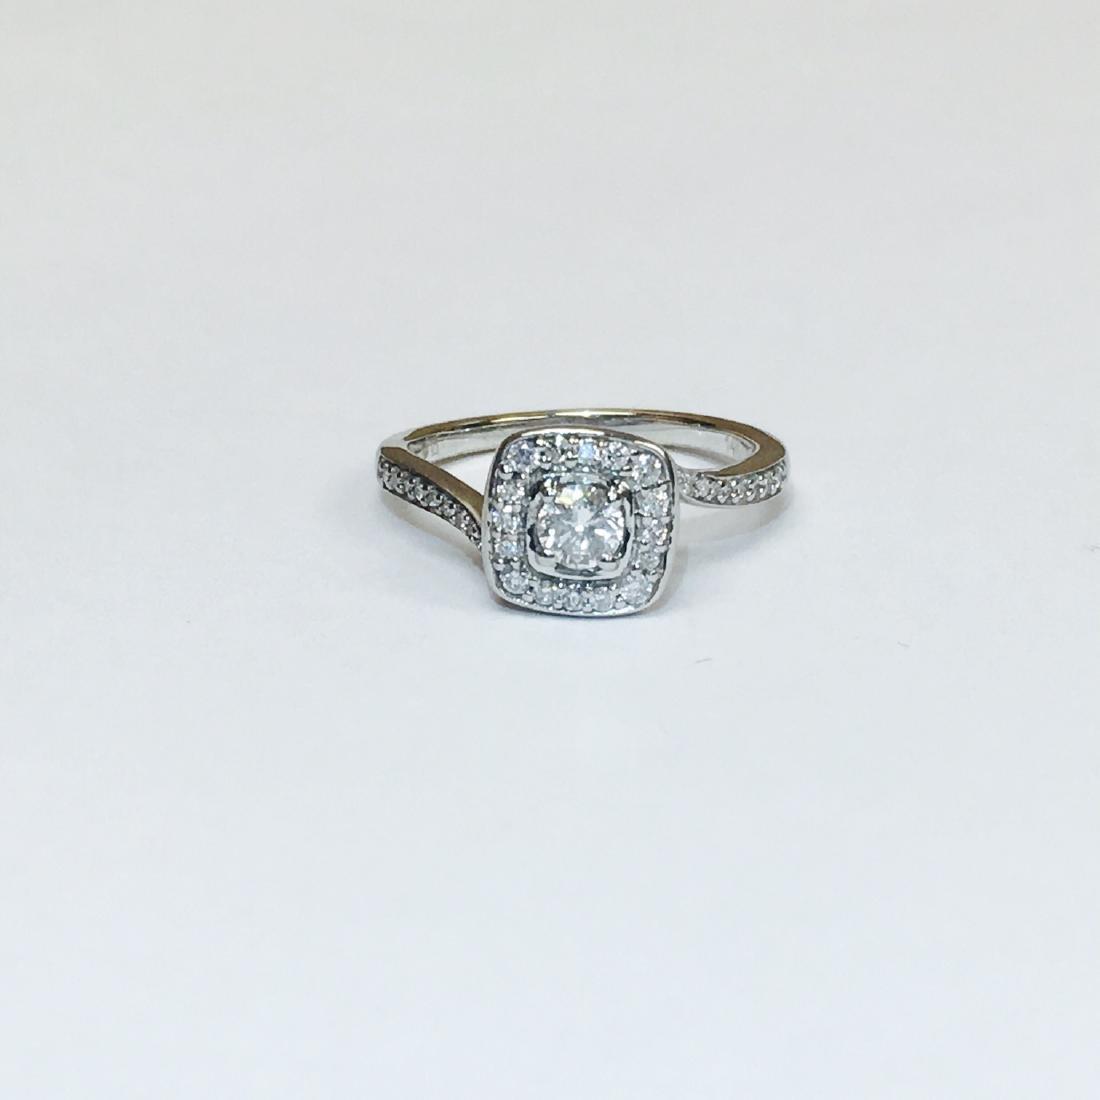 14K White Gold, VS 0.75 Carat Diamond Ring